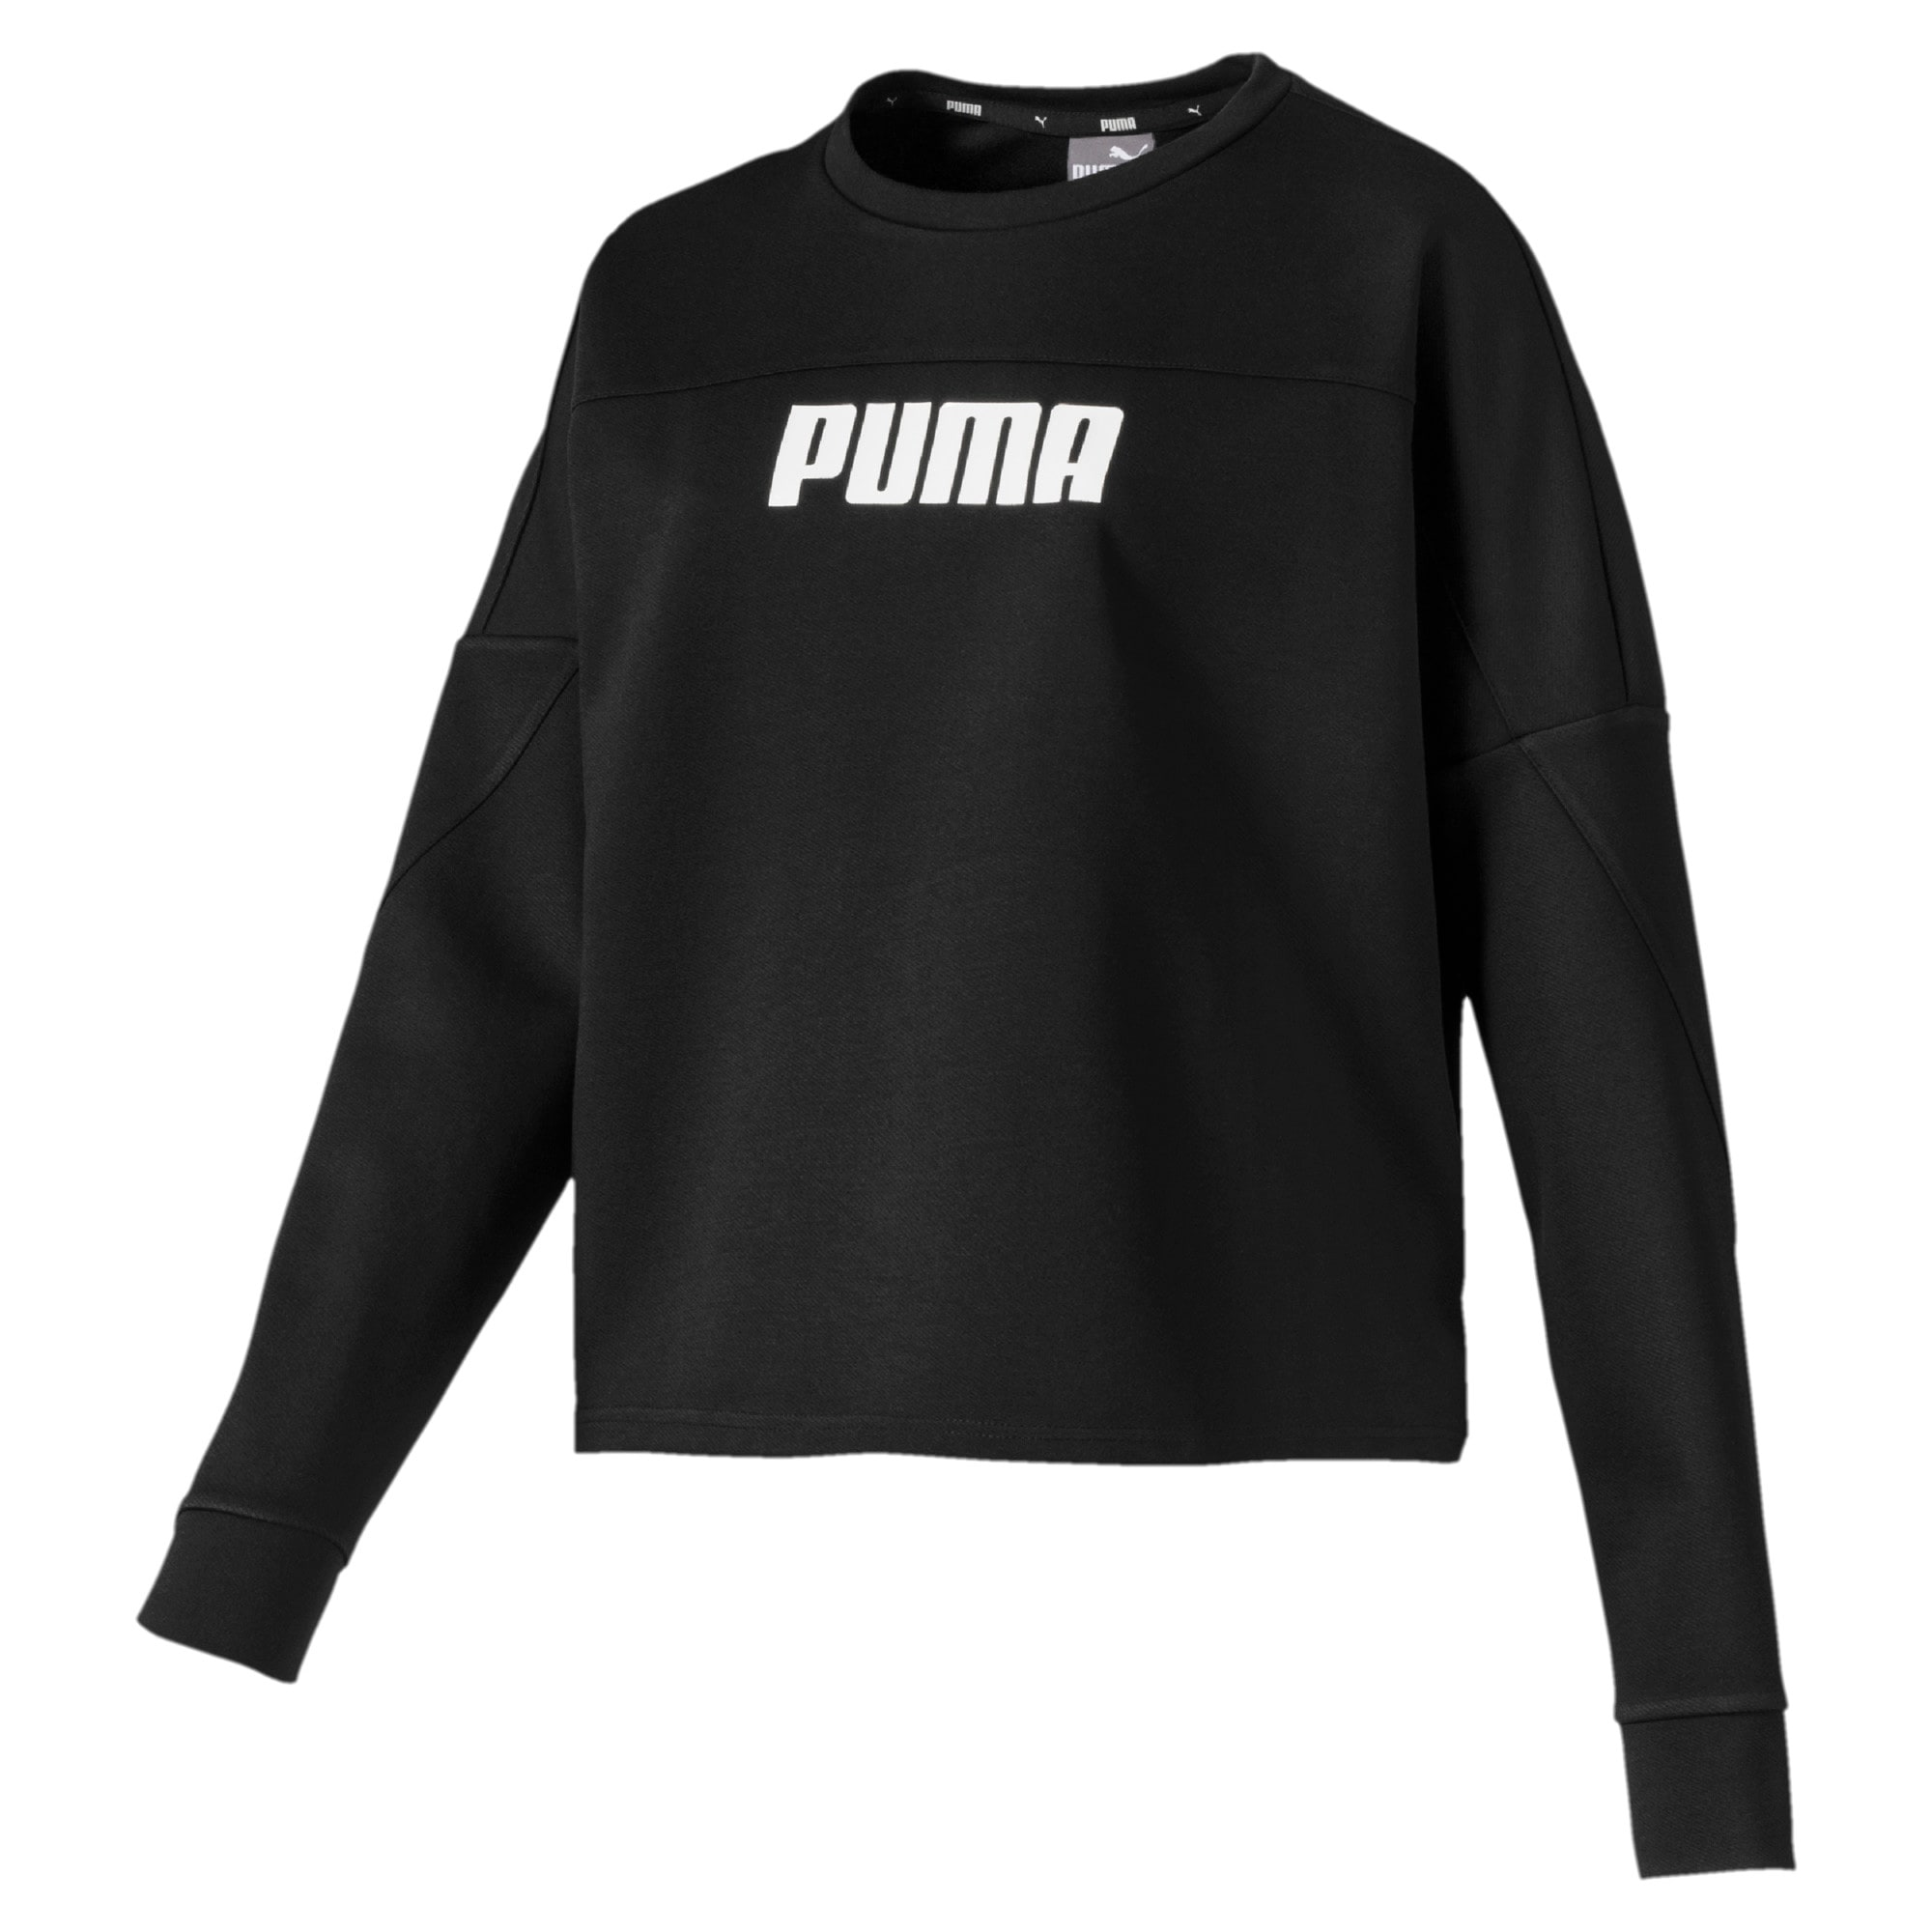 Thumbnail 4 of NU-TILITY Cropped Crew Women's Sweater, Puma Black, medium